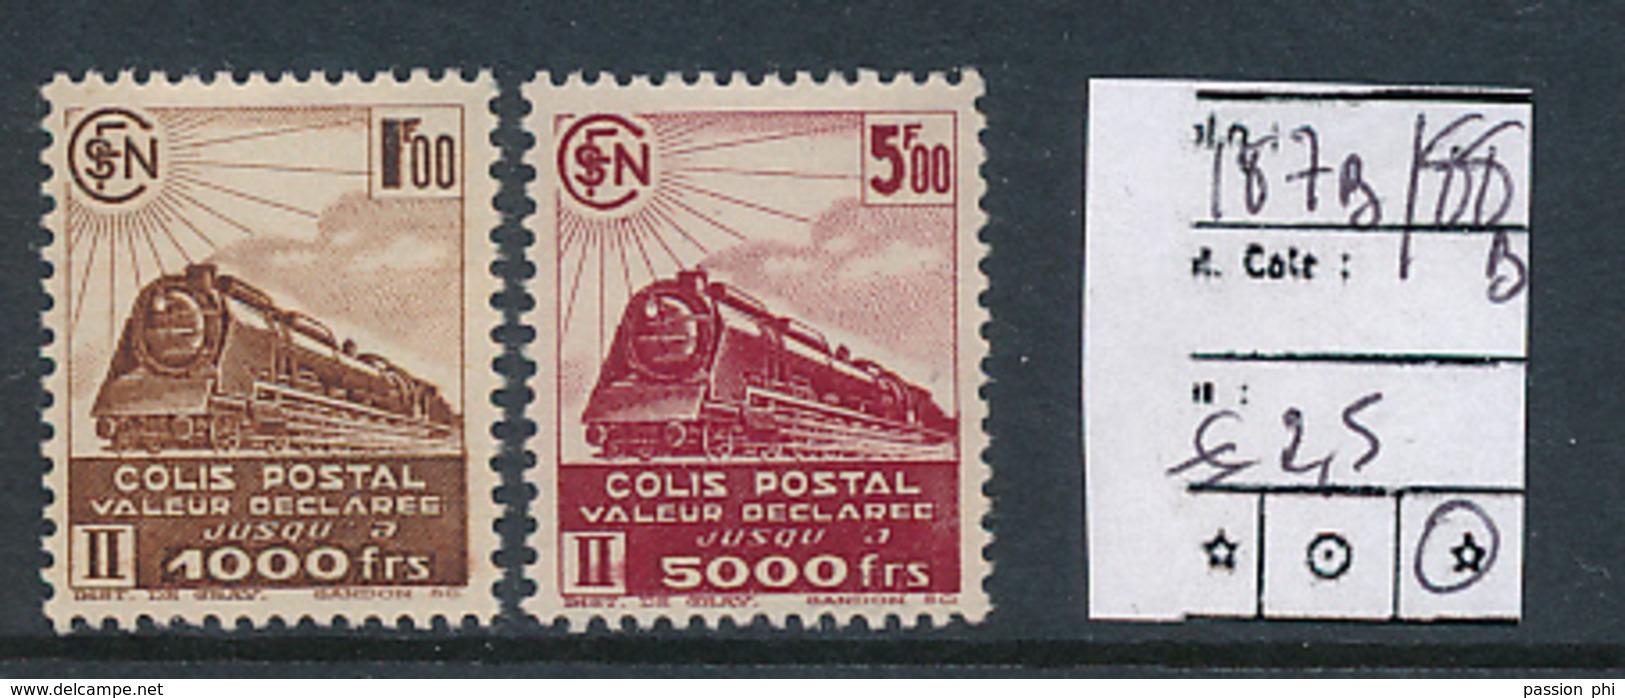 FRANCE CF YVERT 187B/188B LH - Colis Postaux